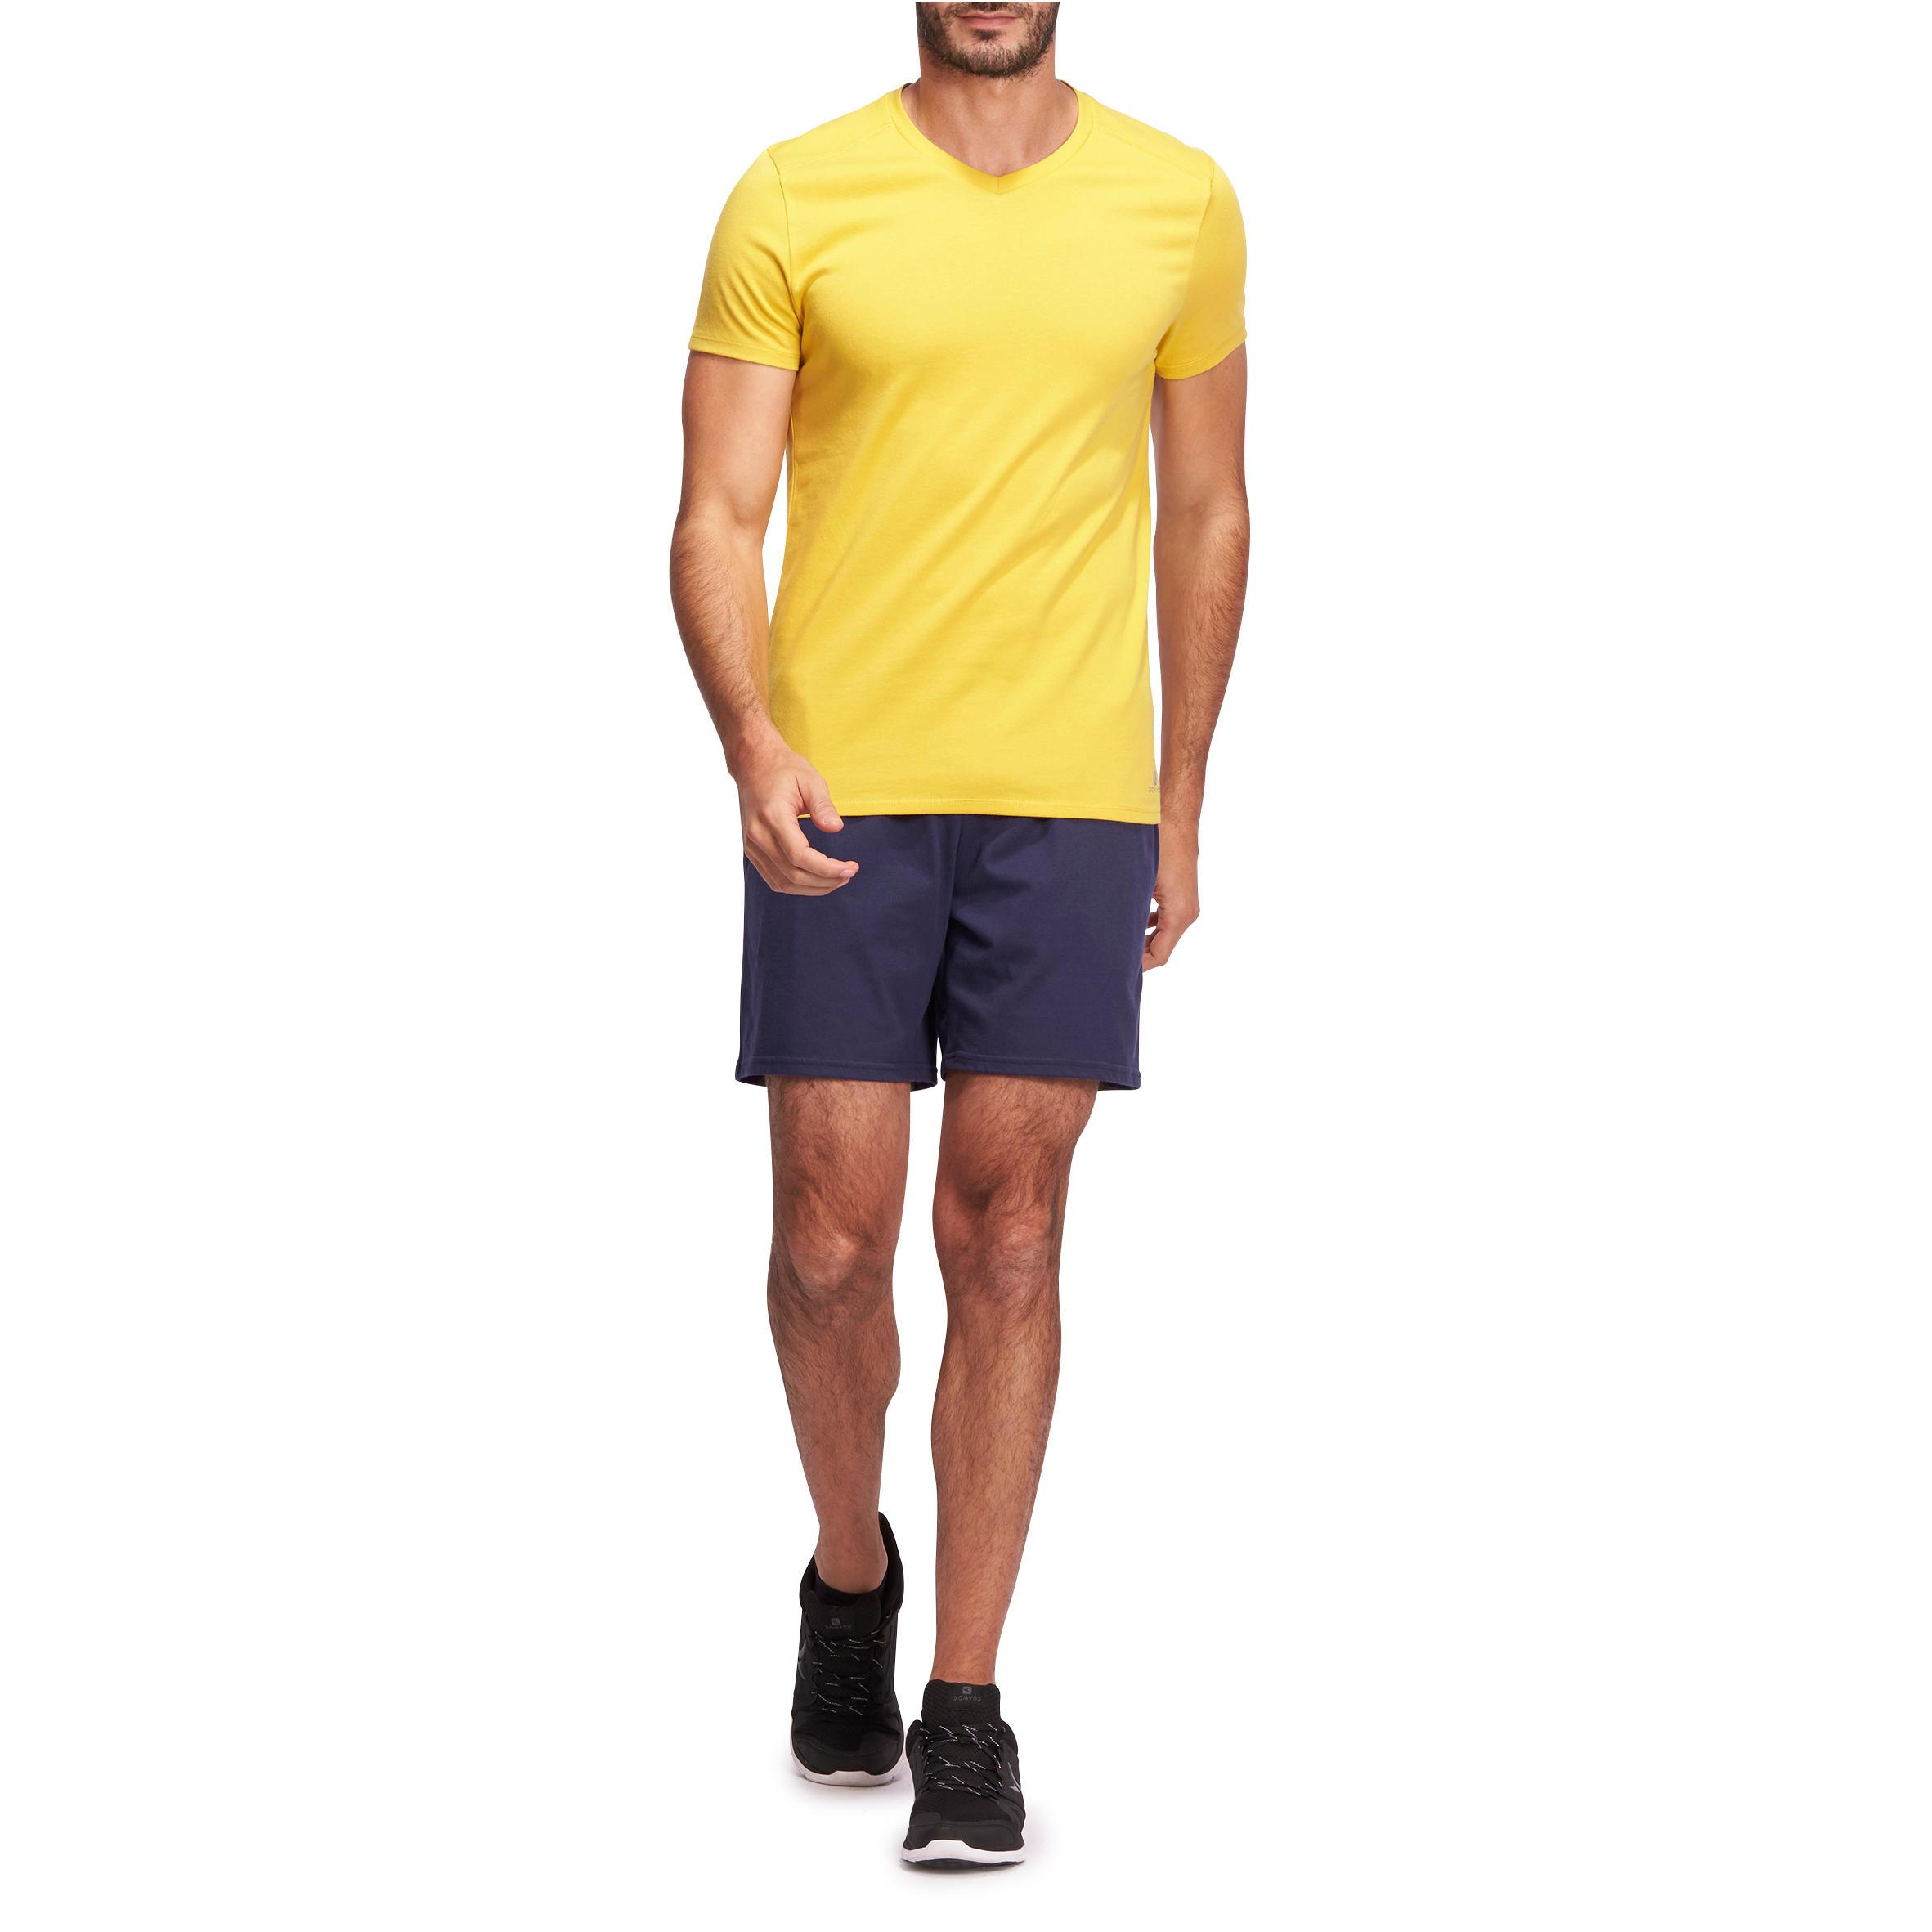 100 Mid-Thigh Regular-Fit Stretching Shorts - Navy Blue